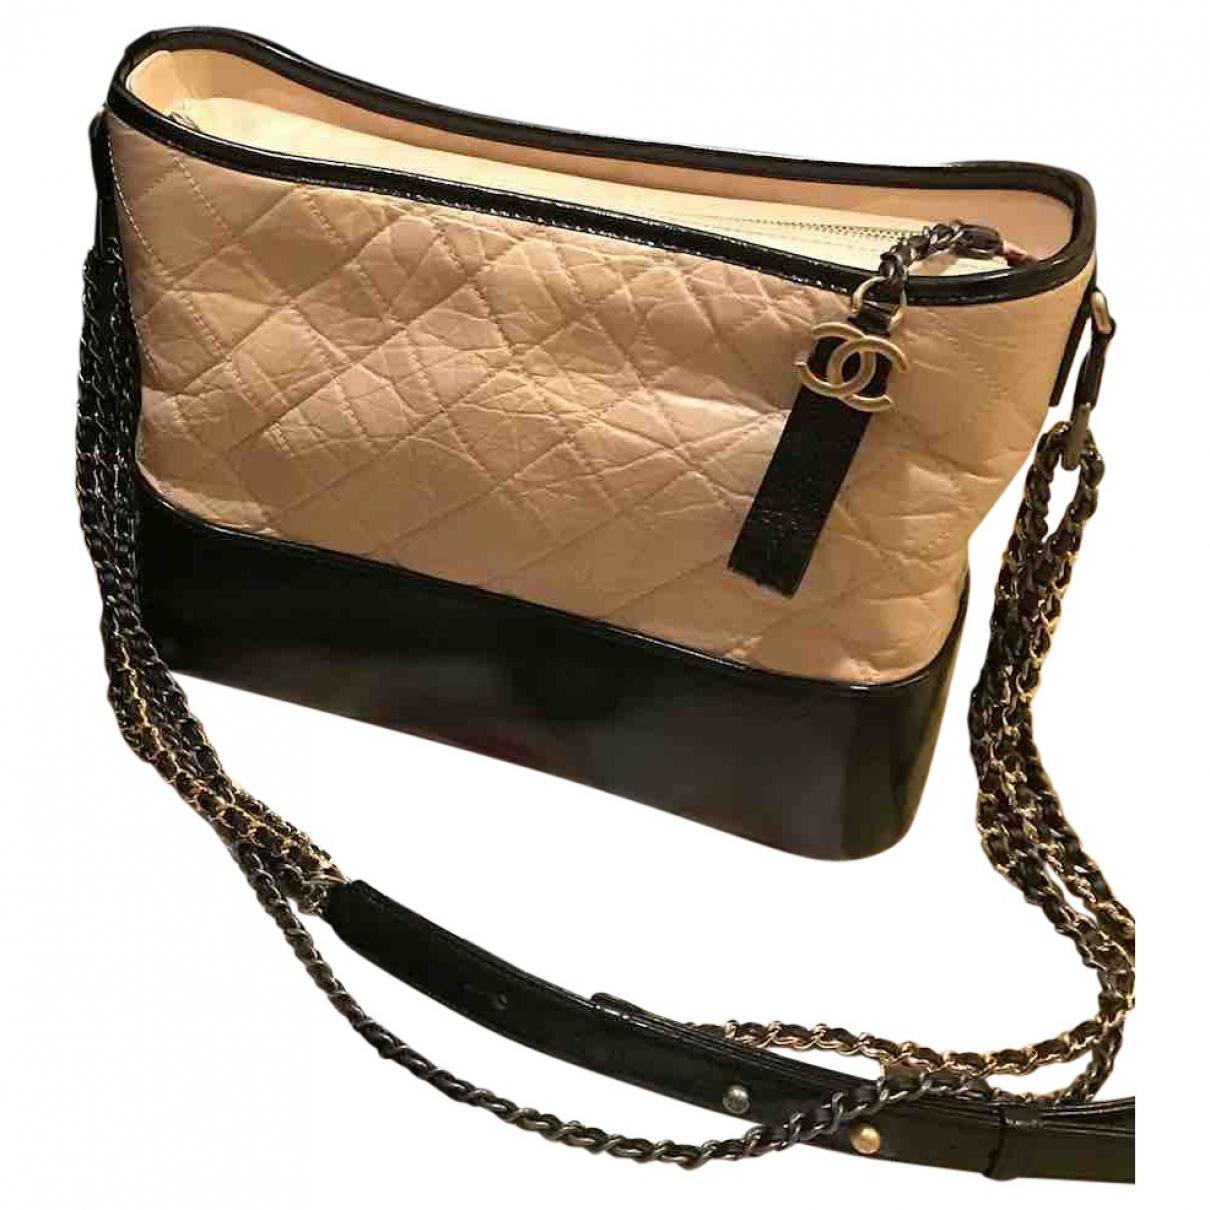 a79d643d2aa1 Chanel. Women s Natural Gabrielle Leather Bag. £3